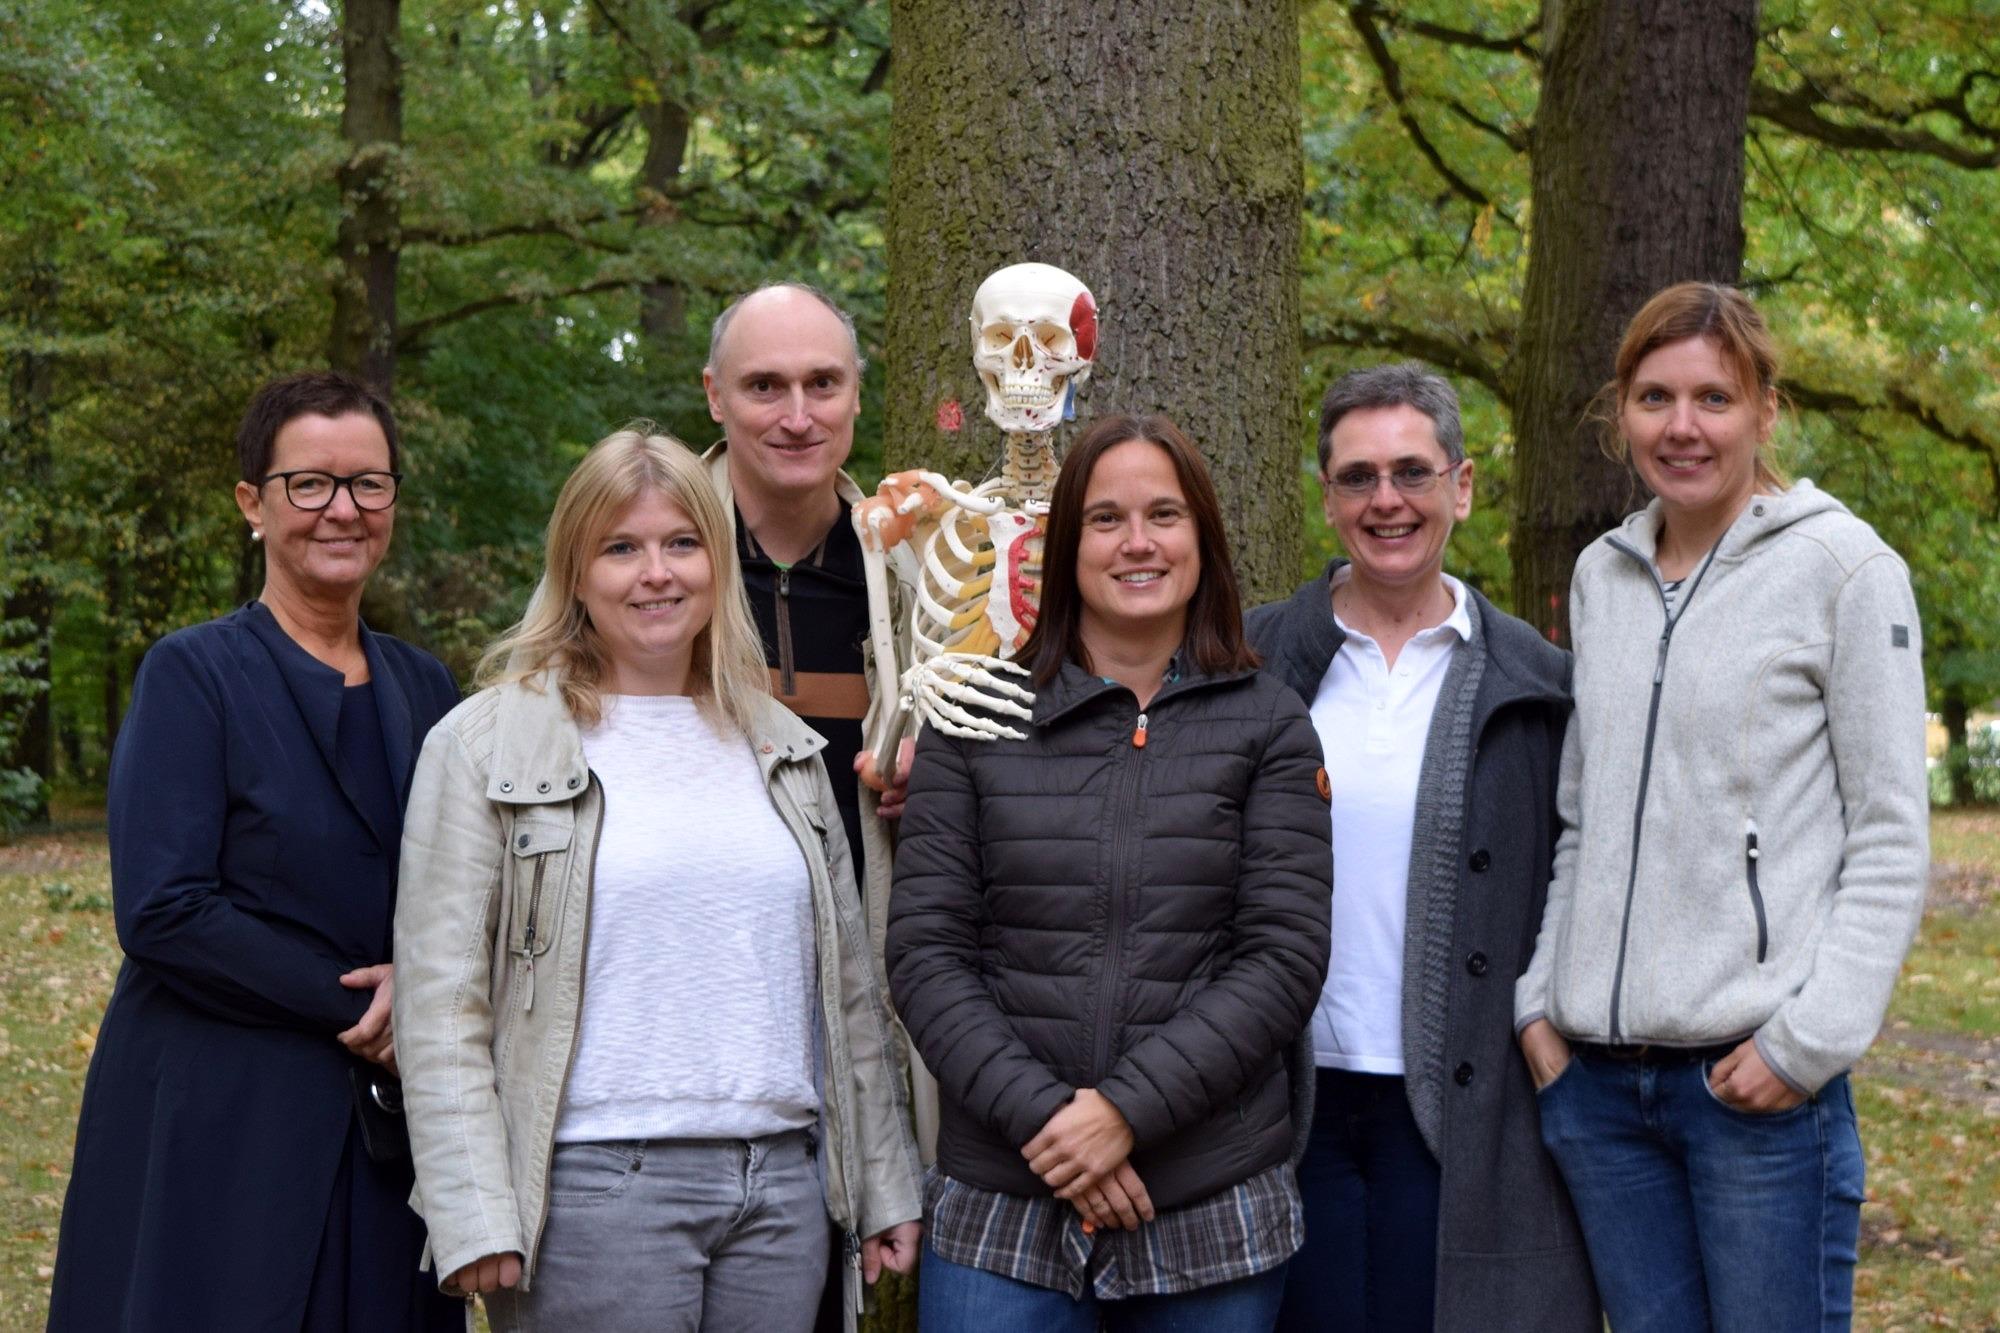 Gruppenbild des Teams der Didaktik der Biologie